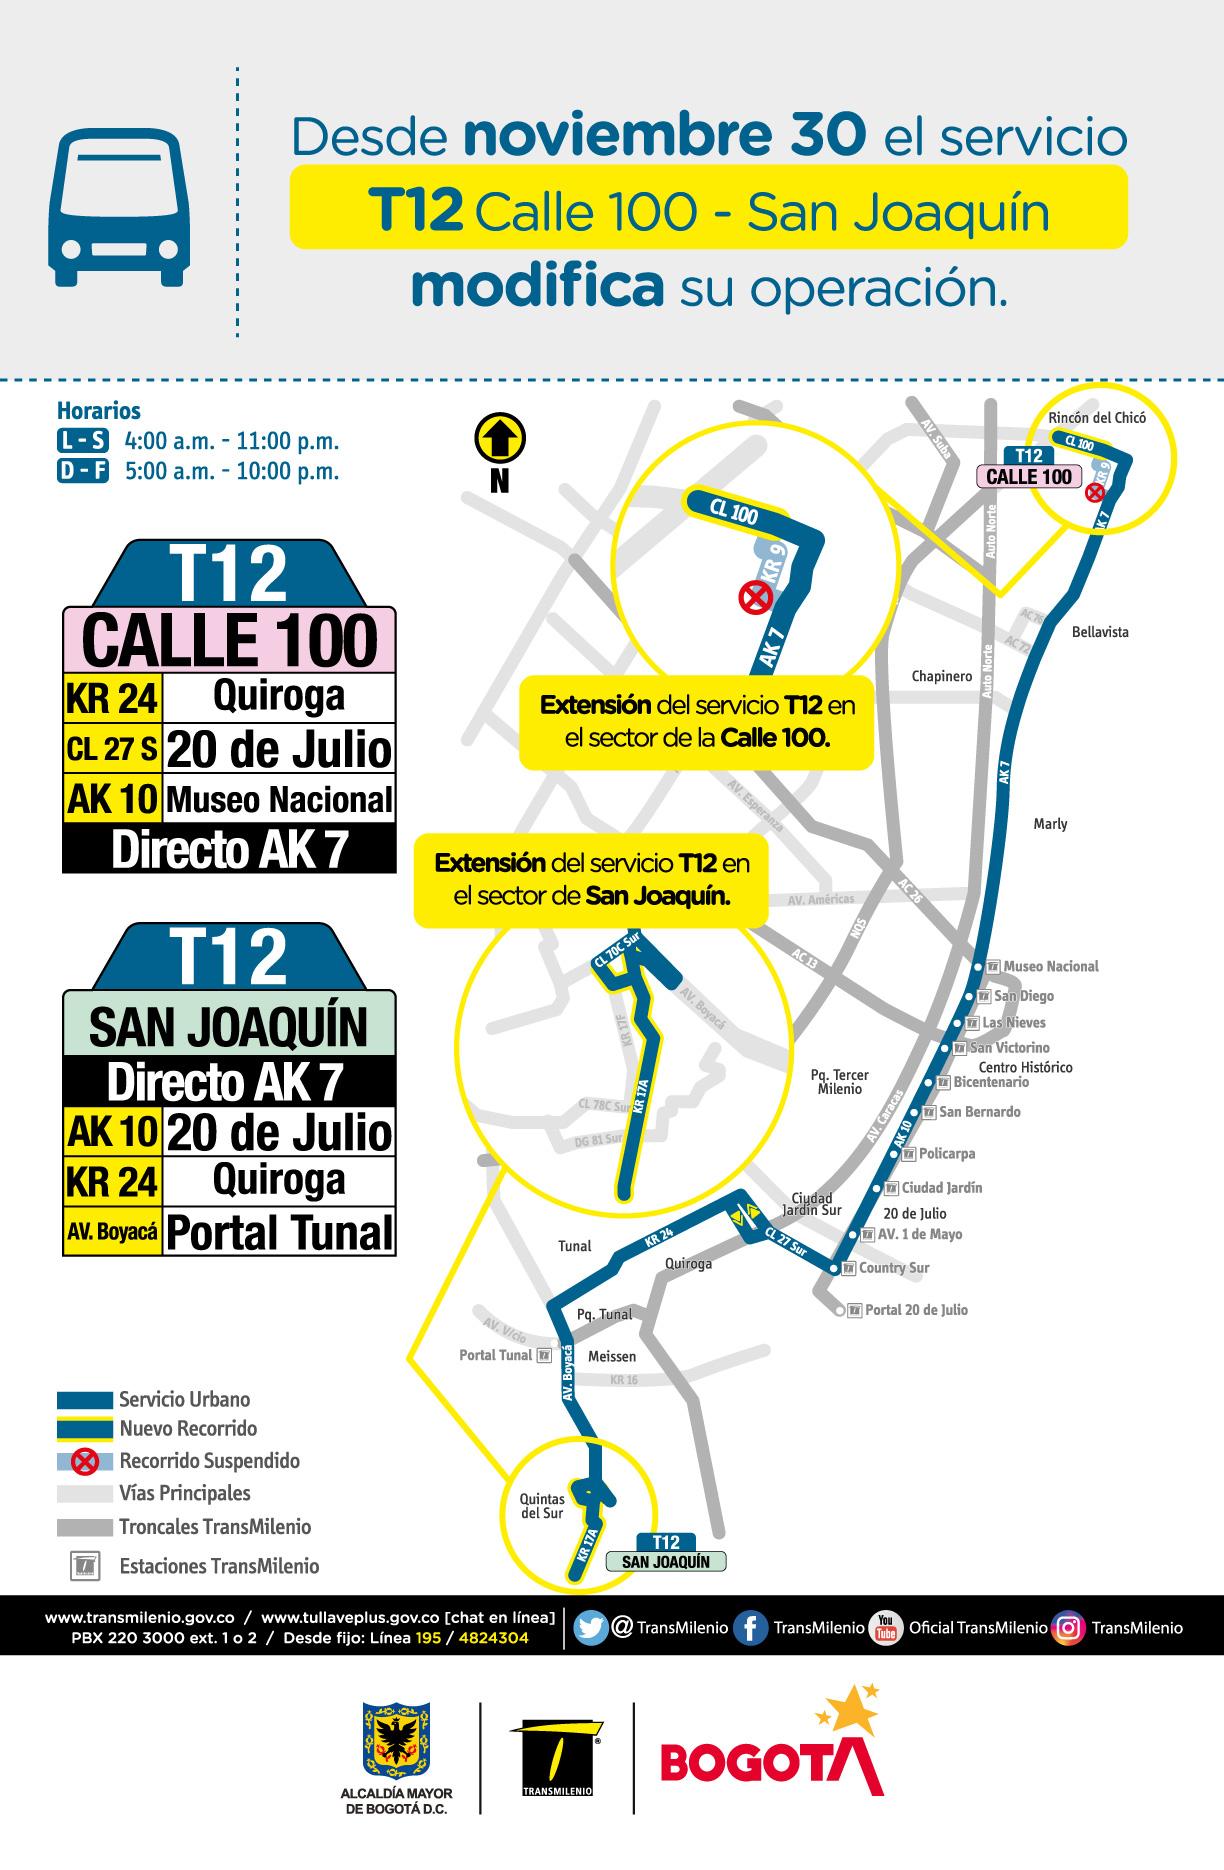 T12 Calle 100 - San Joaquín